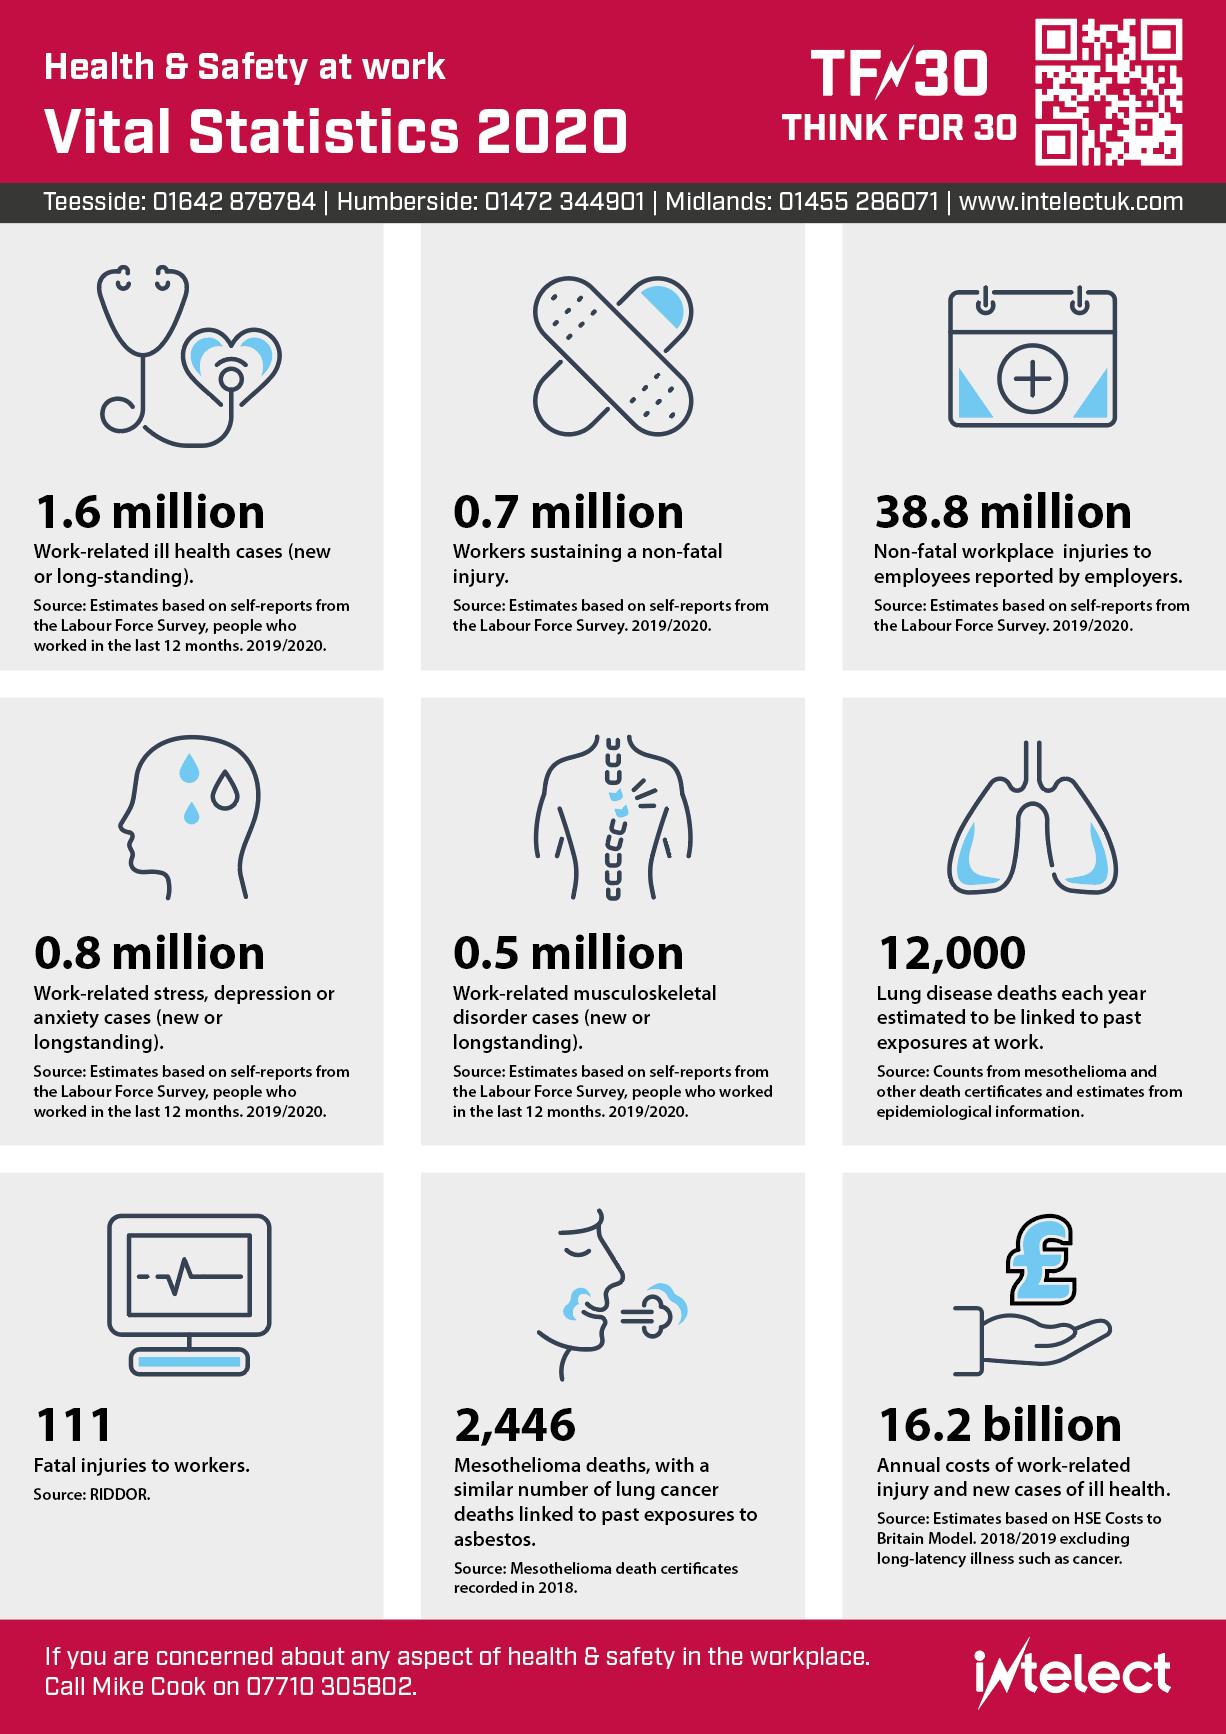 Health & Safety at work Vital Statistics 2020